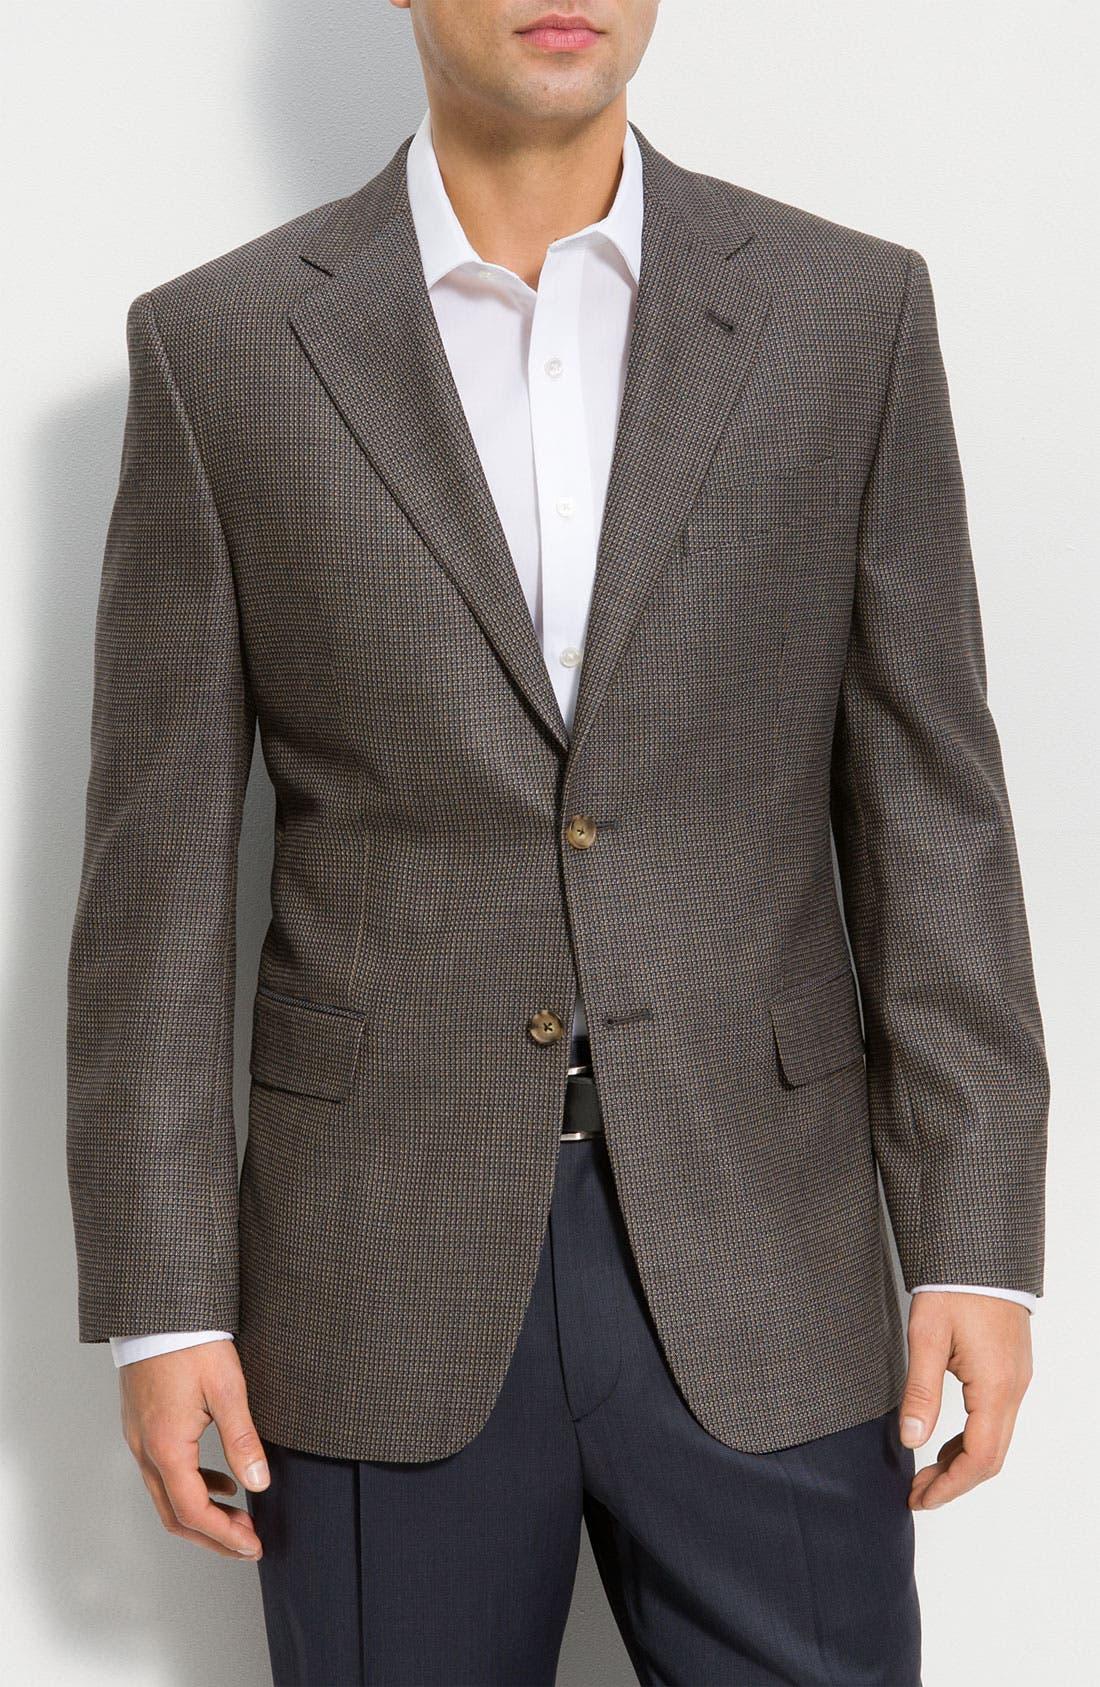 Alternate Image 1 Selected - Joseph Abboud 'Profile' Sportcoat